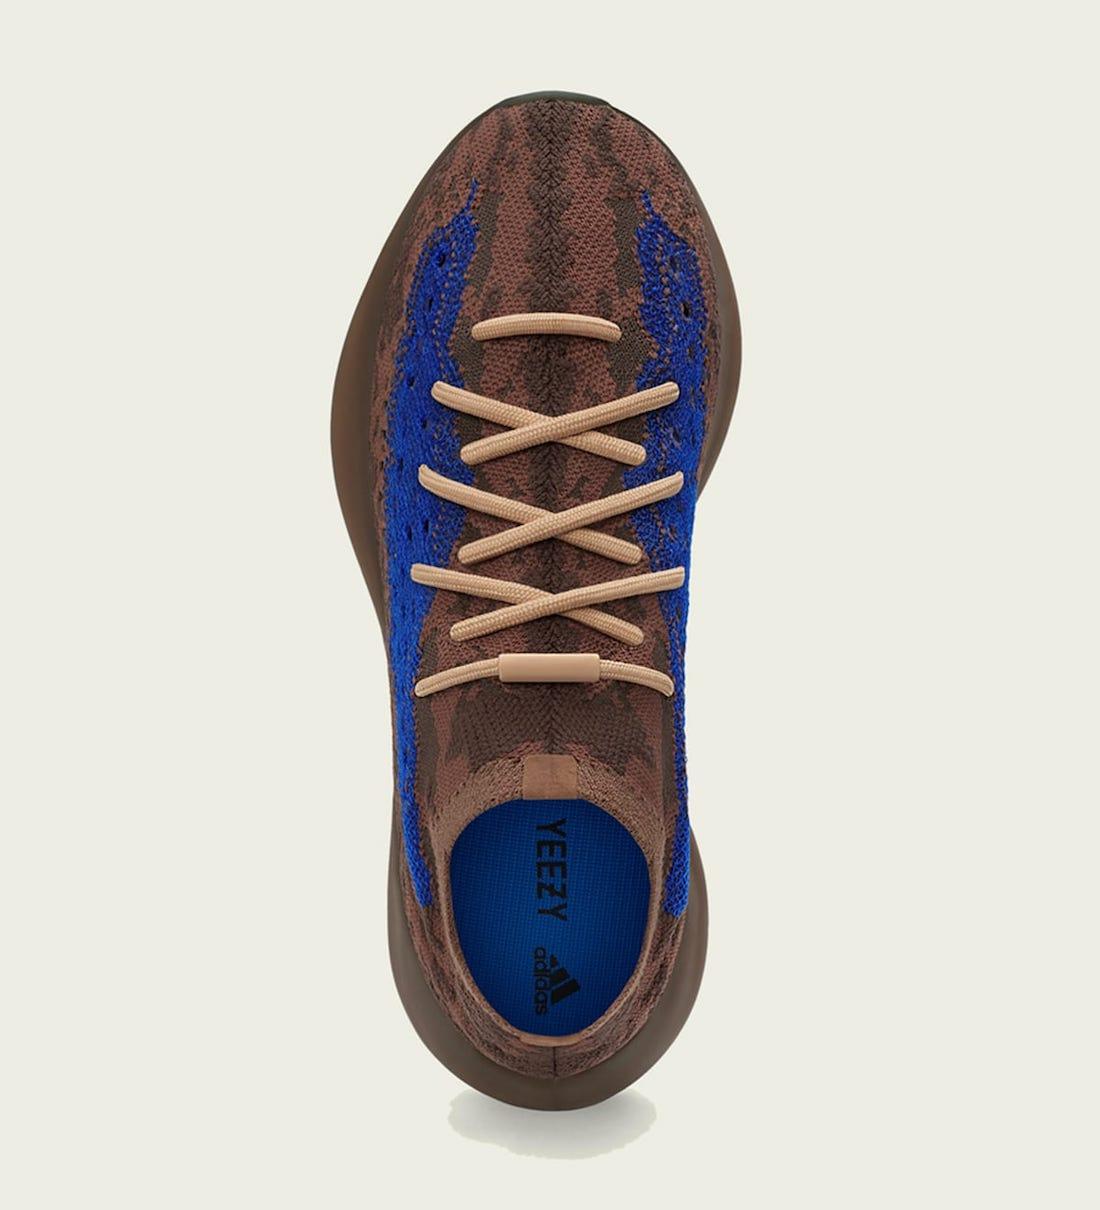 adidas Yeezy Boost 380 Azure FZ4986 Release Date